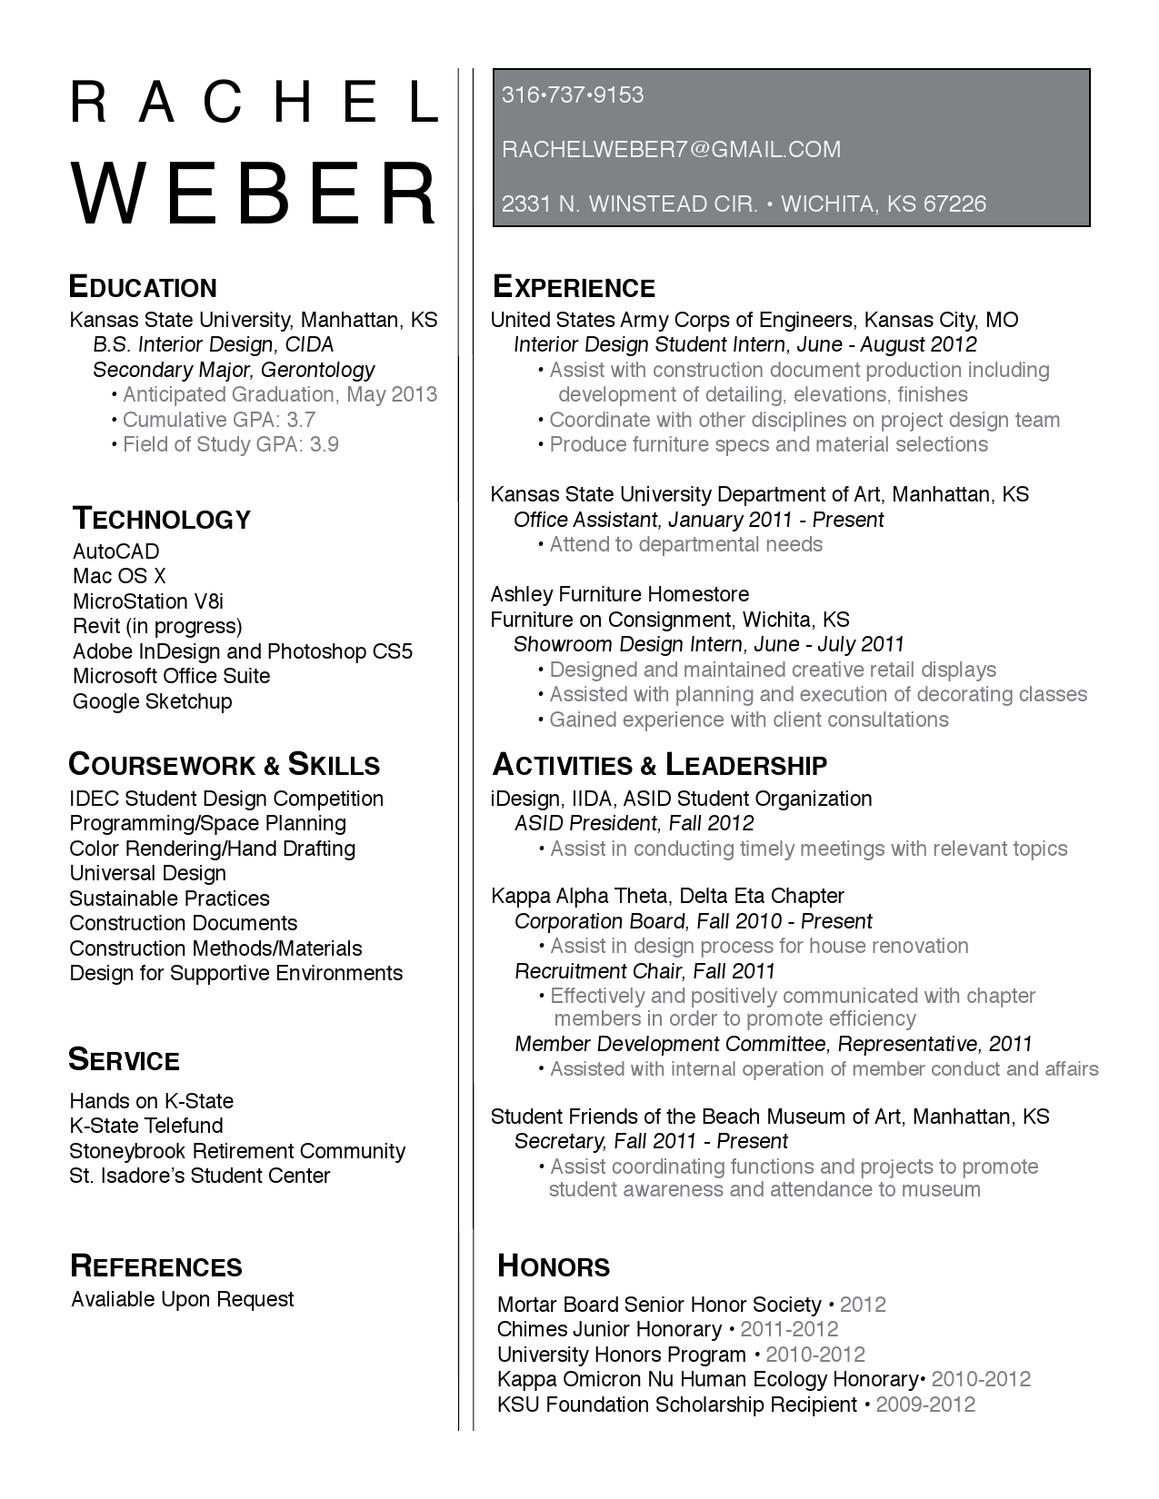 Rachel Weber Resume By